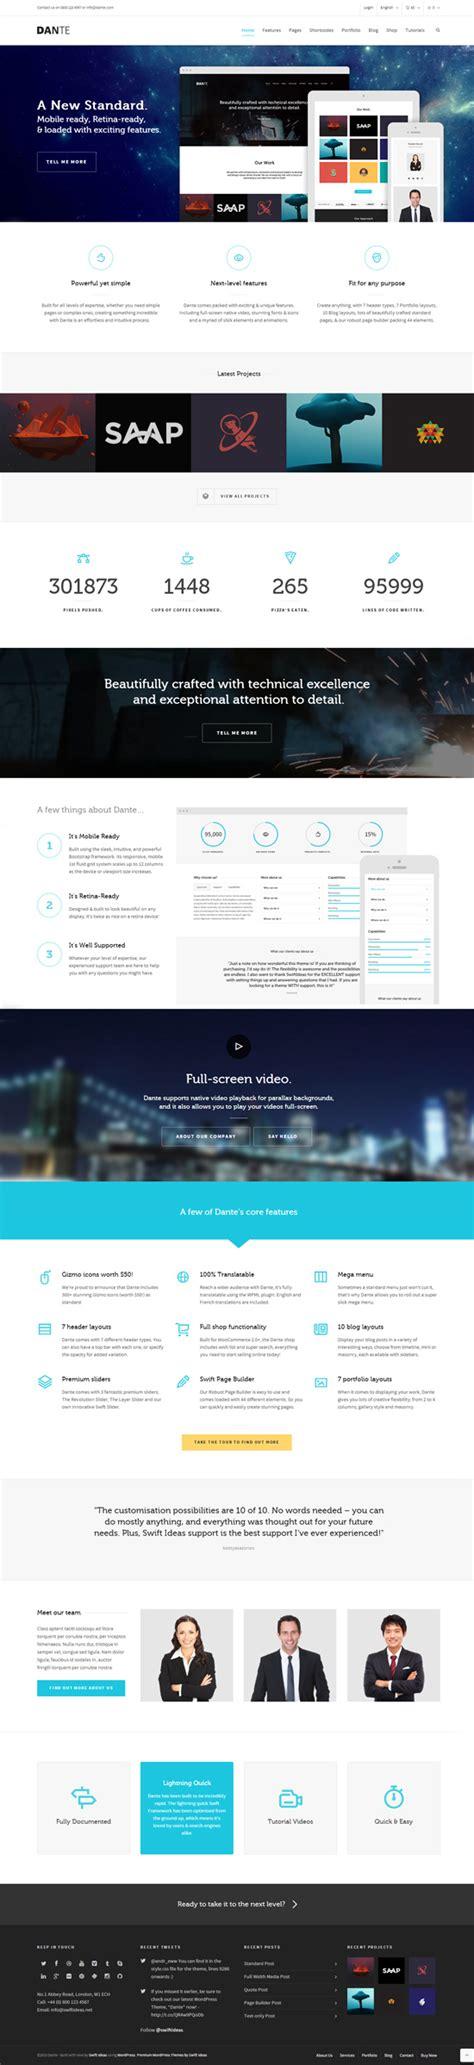 theme wordpress dante 12 new high quality responsive wordpress themes